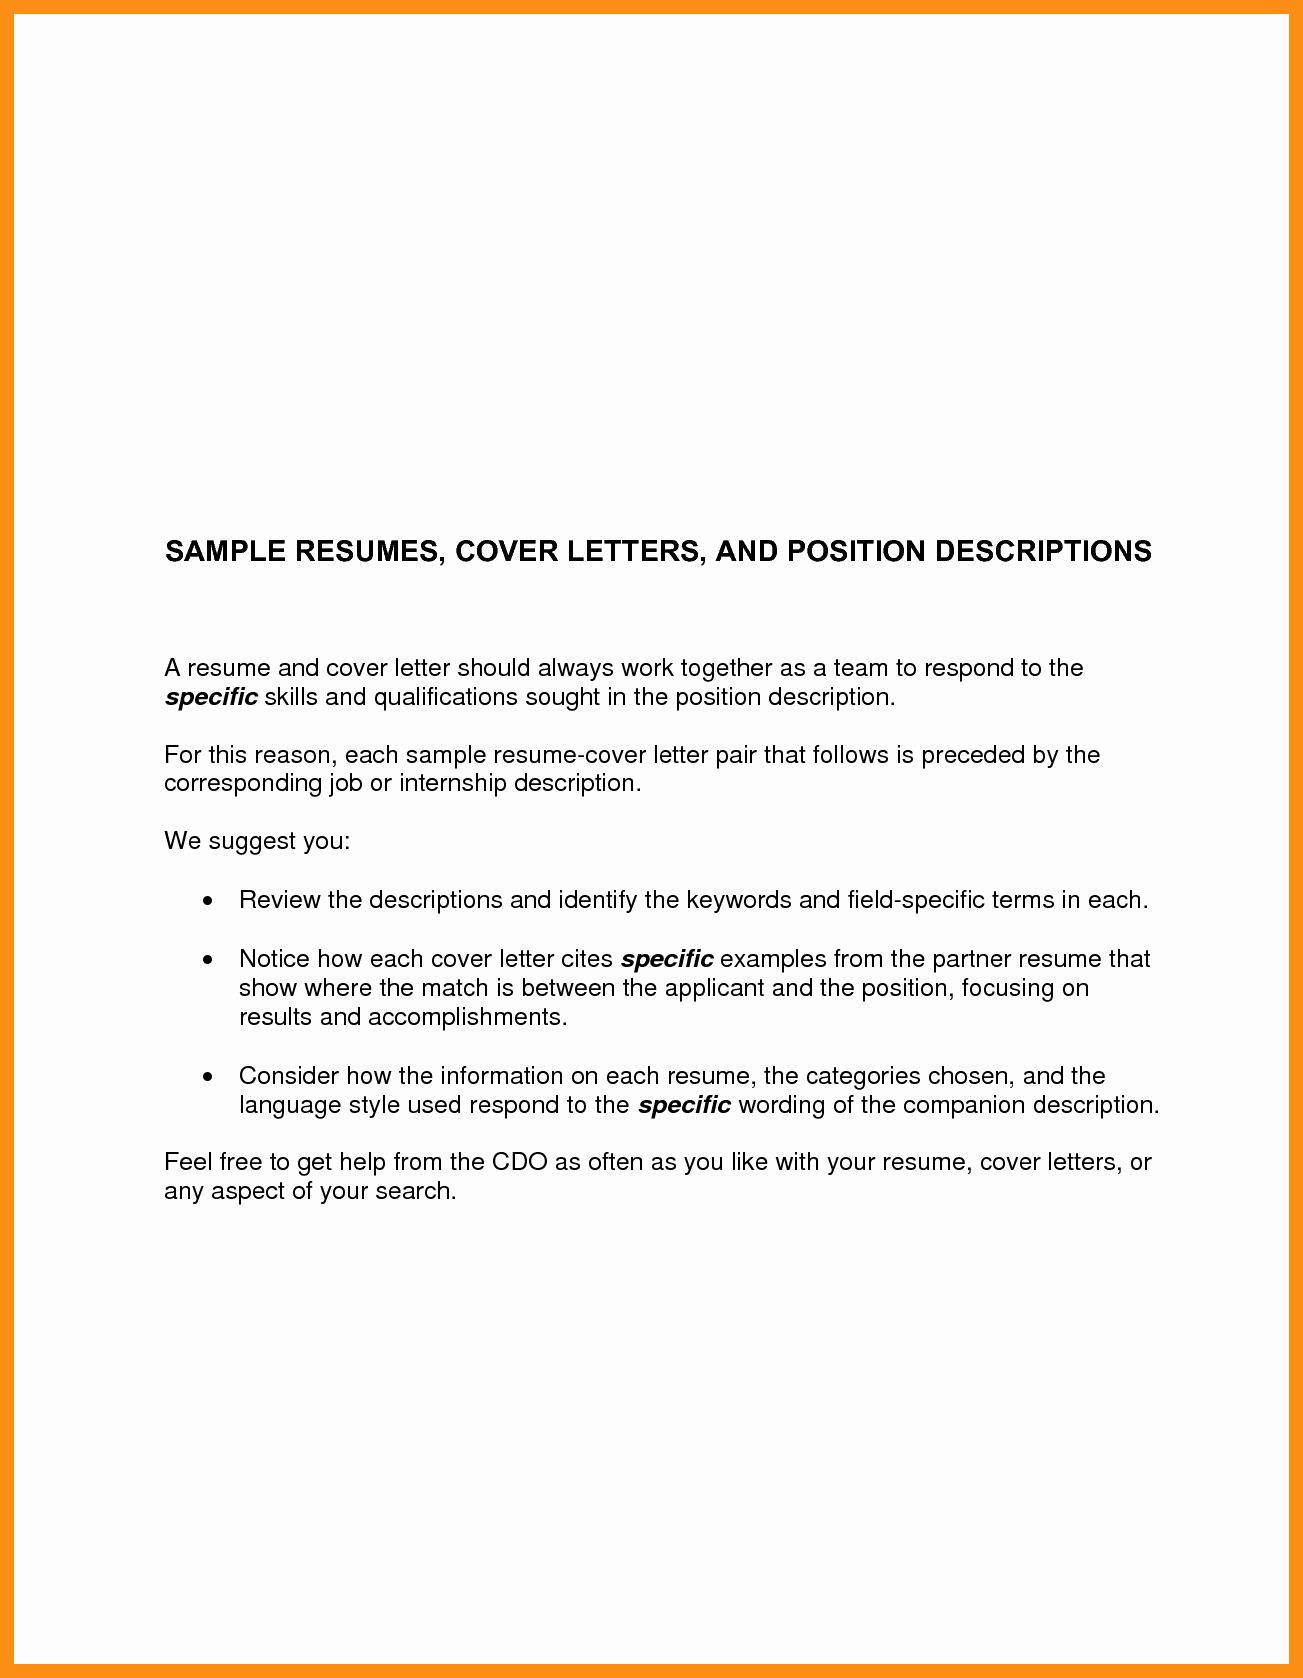 Basic Resume Cover Letter Template Unique Basic Cover Letter for Any Job